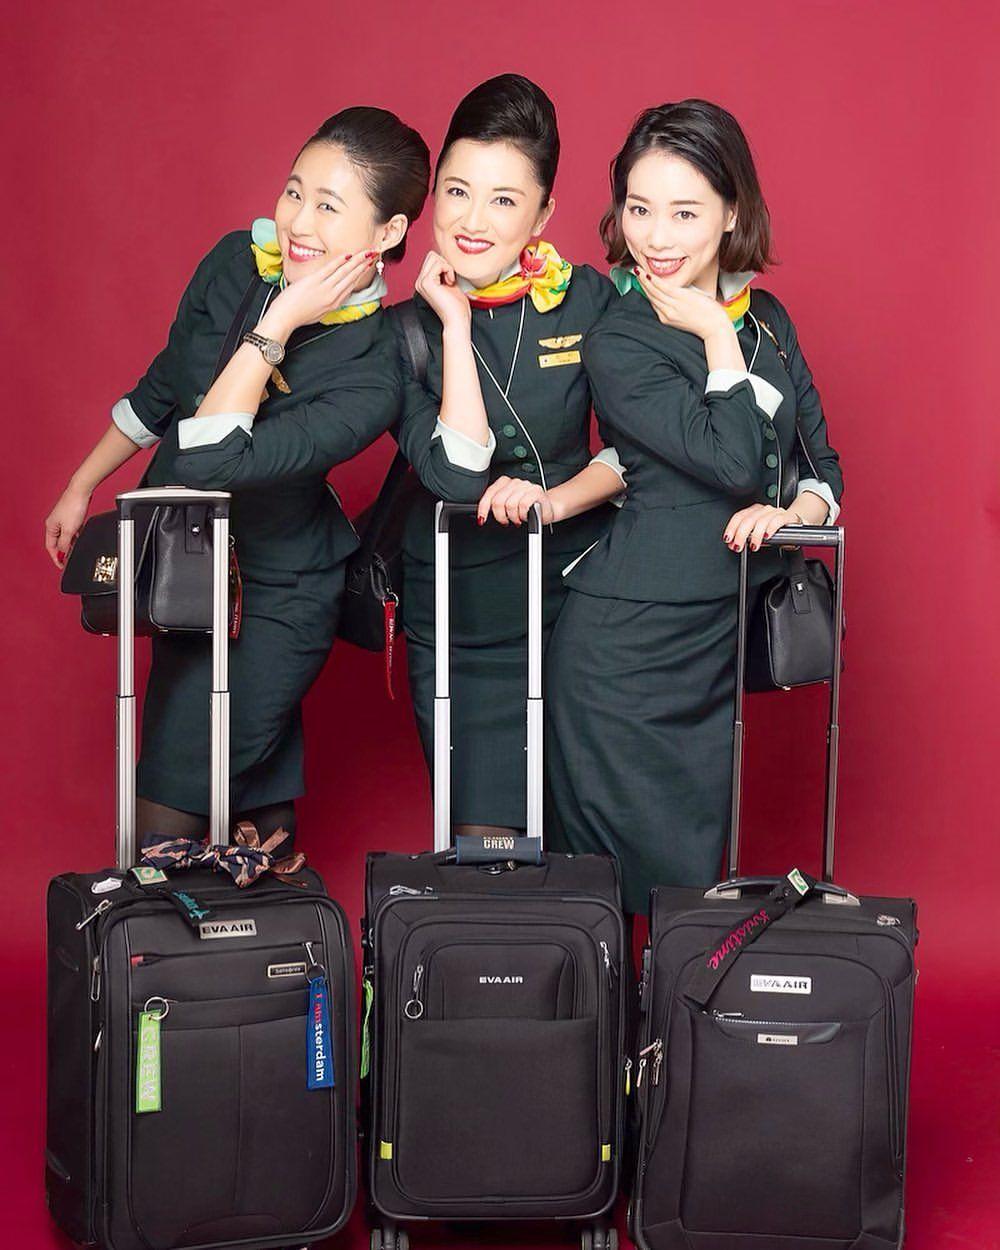 Instagram posts at 長榮航空訓練大樓EVA AIR TRAINING CENTER Picdeer